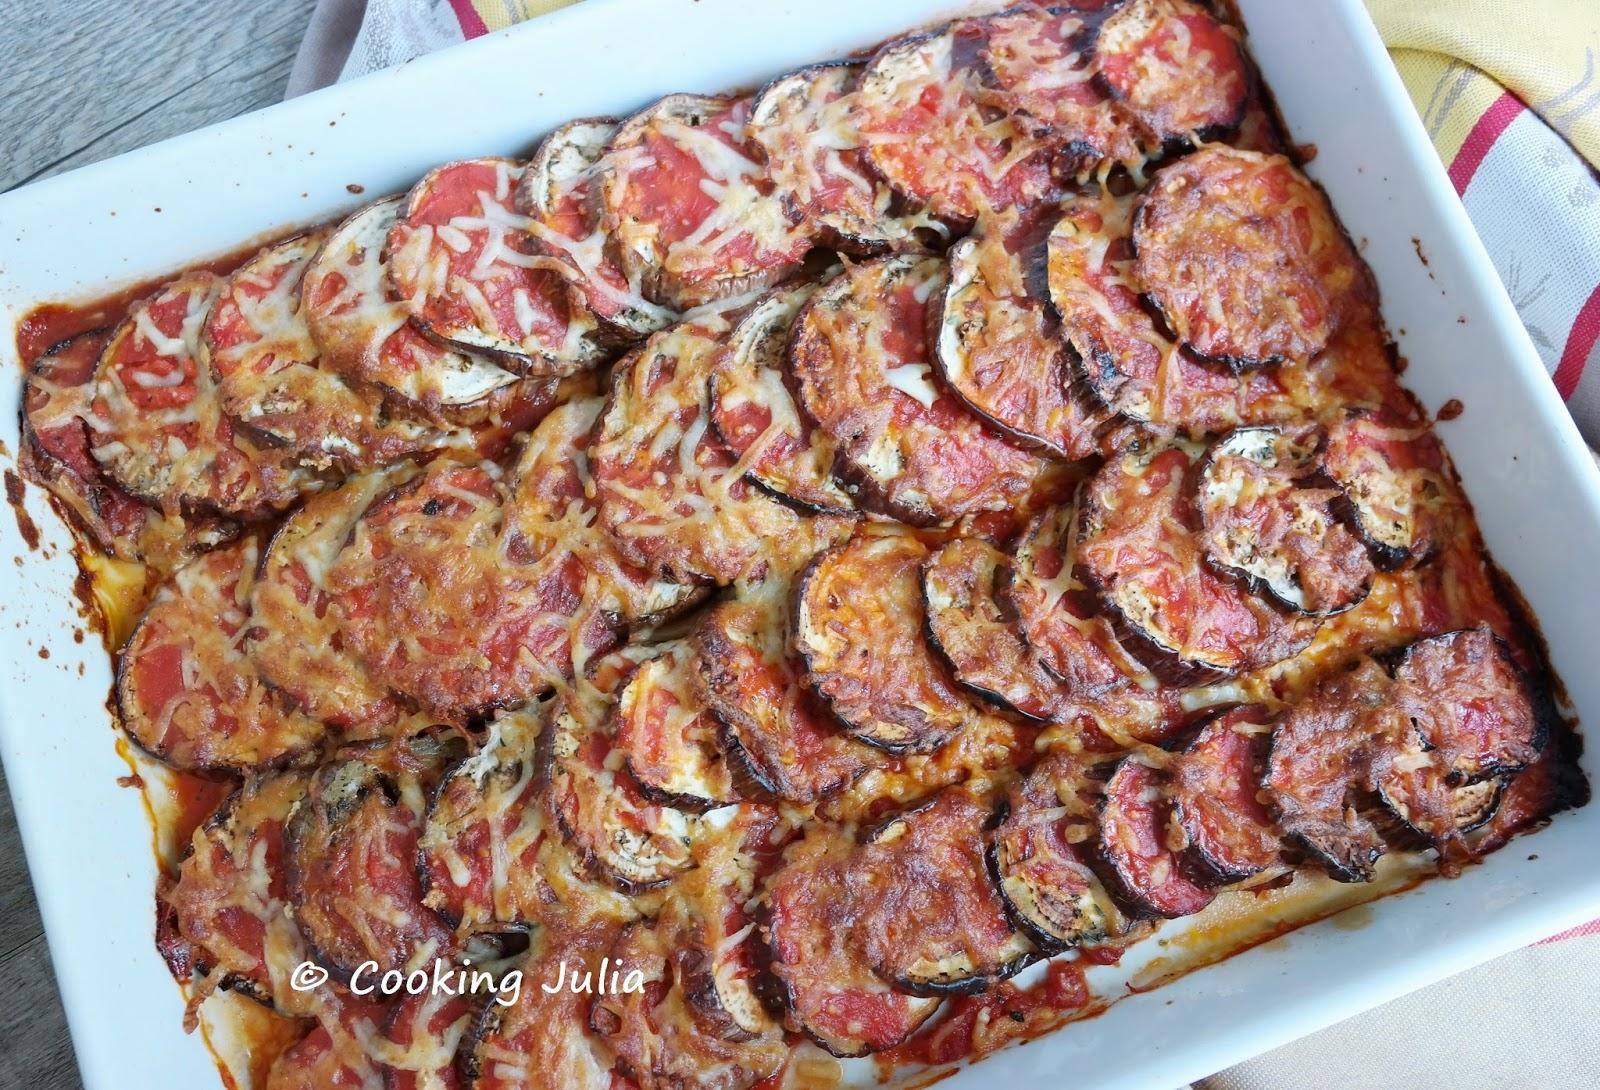 Cooking julia aubergines gratin es la tomate - Cuisiner des tomates sechees ...